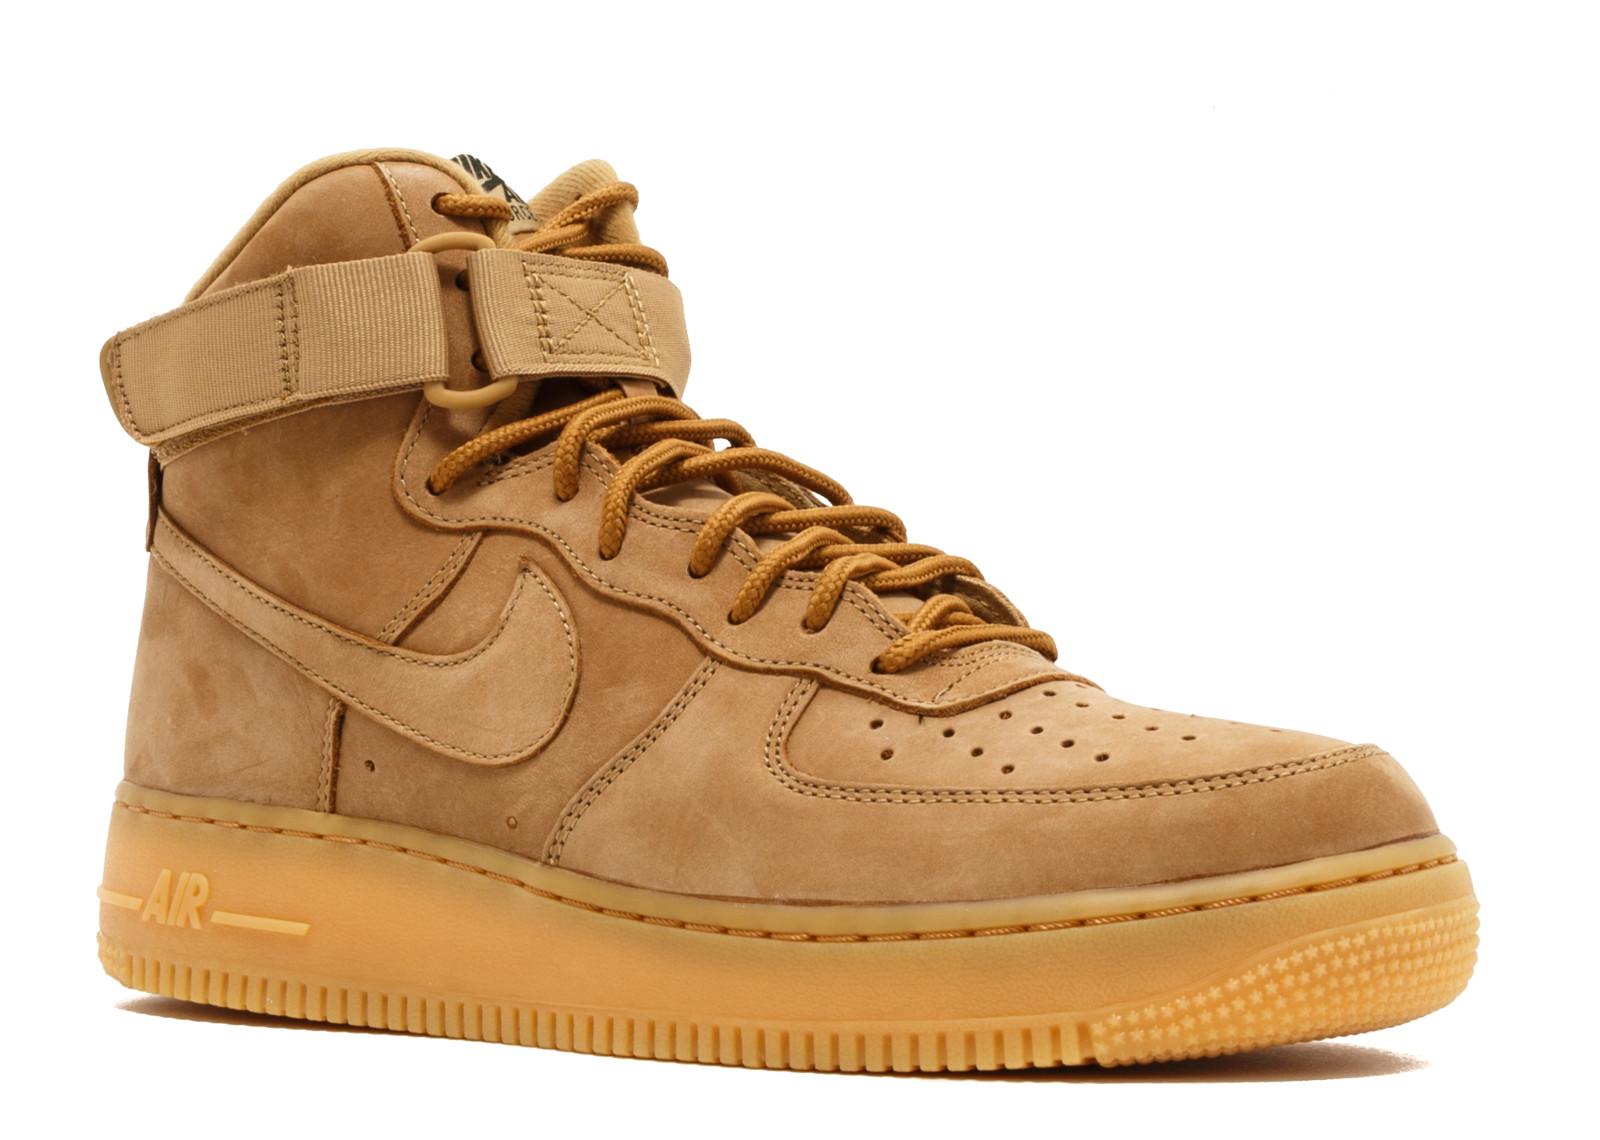 Mens – Nike Air Force 1 High '07 LV8 WB FlaxFlax Outdoor